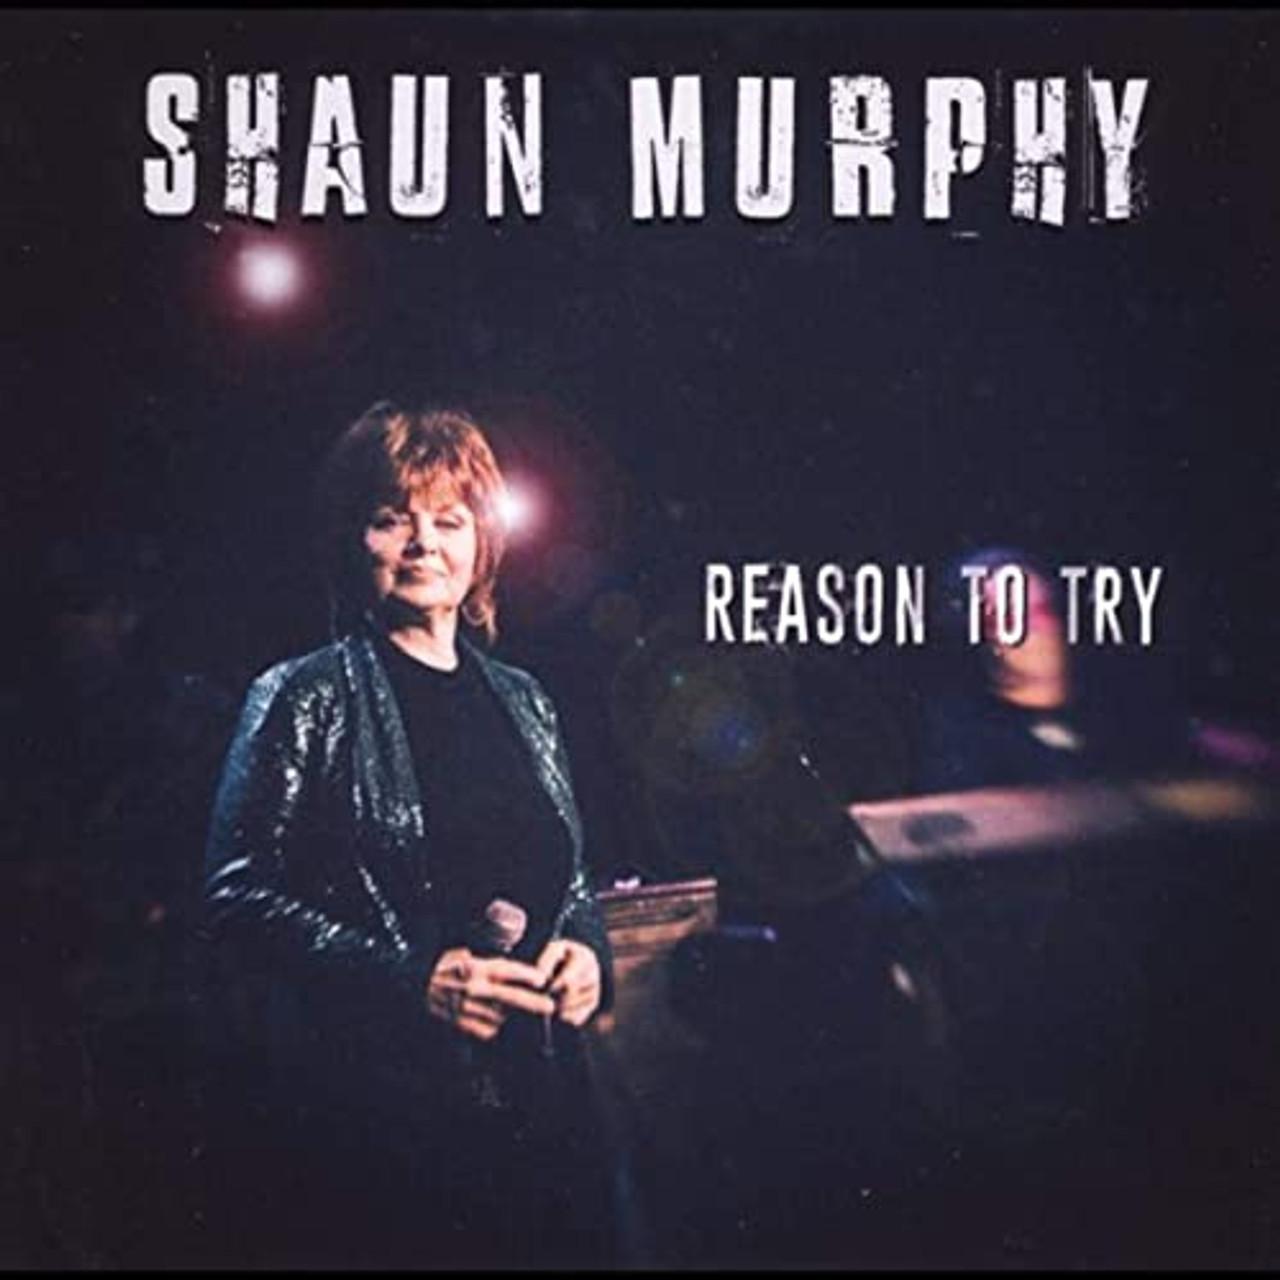 SHAUN MURPHY - REASON TO TRY